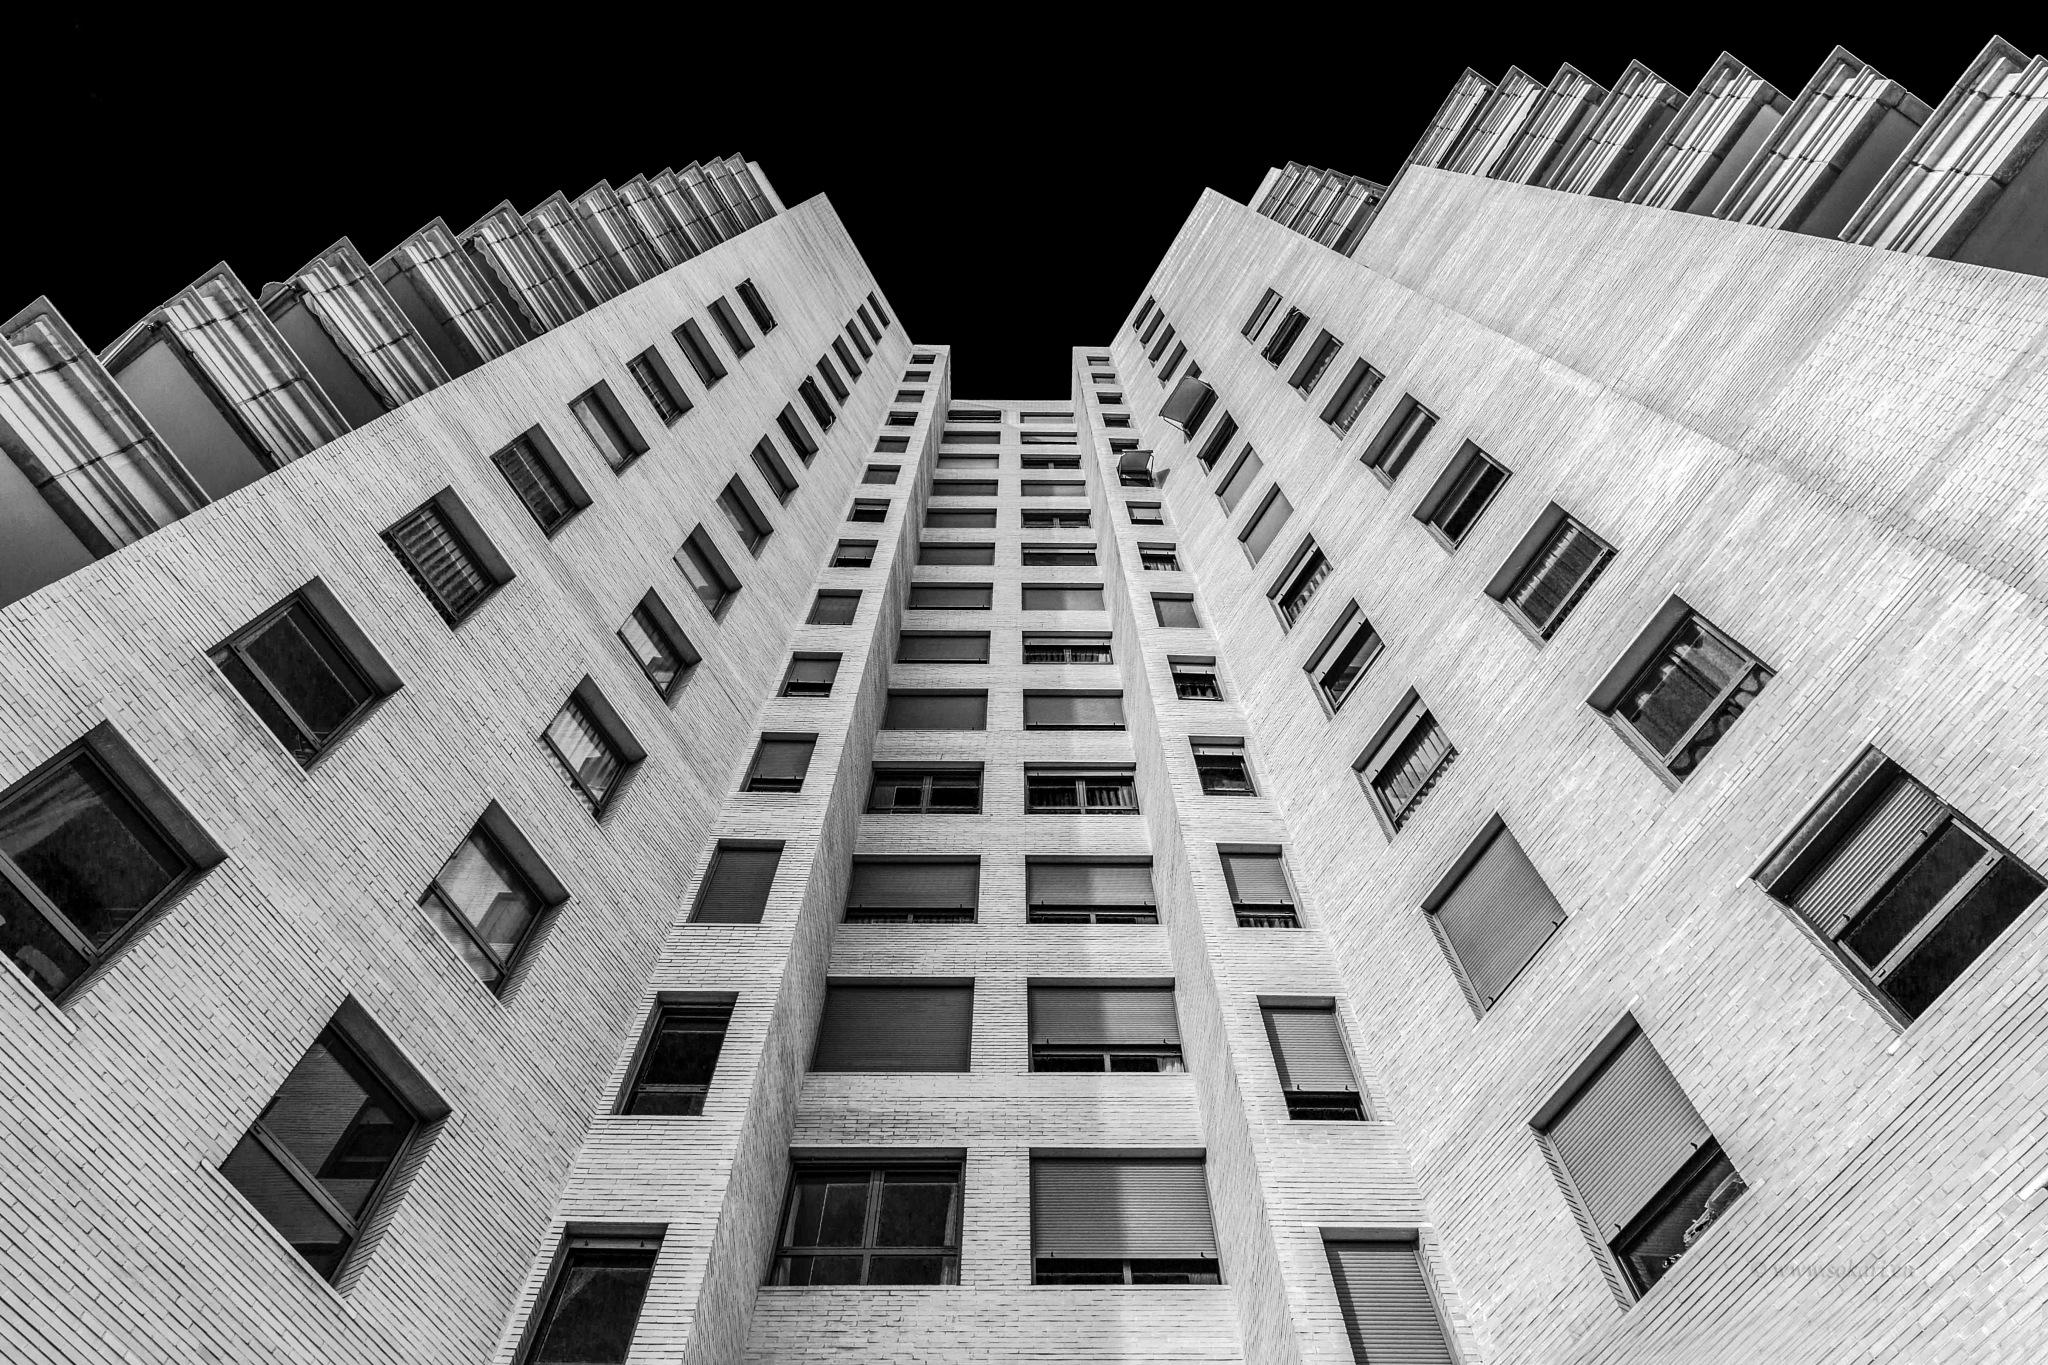 Apartment Block by sokarieu